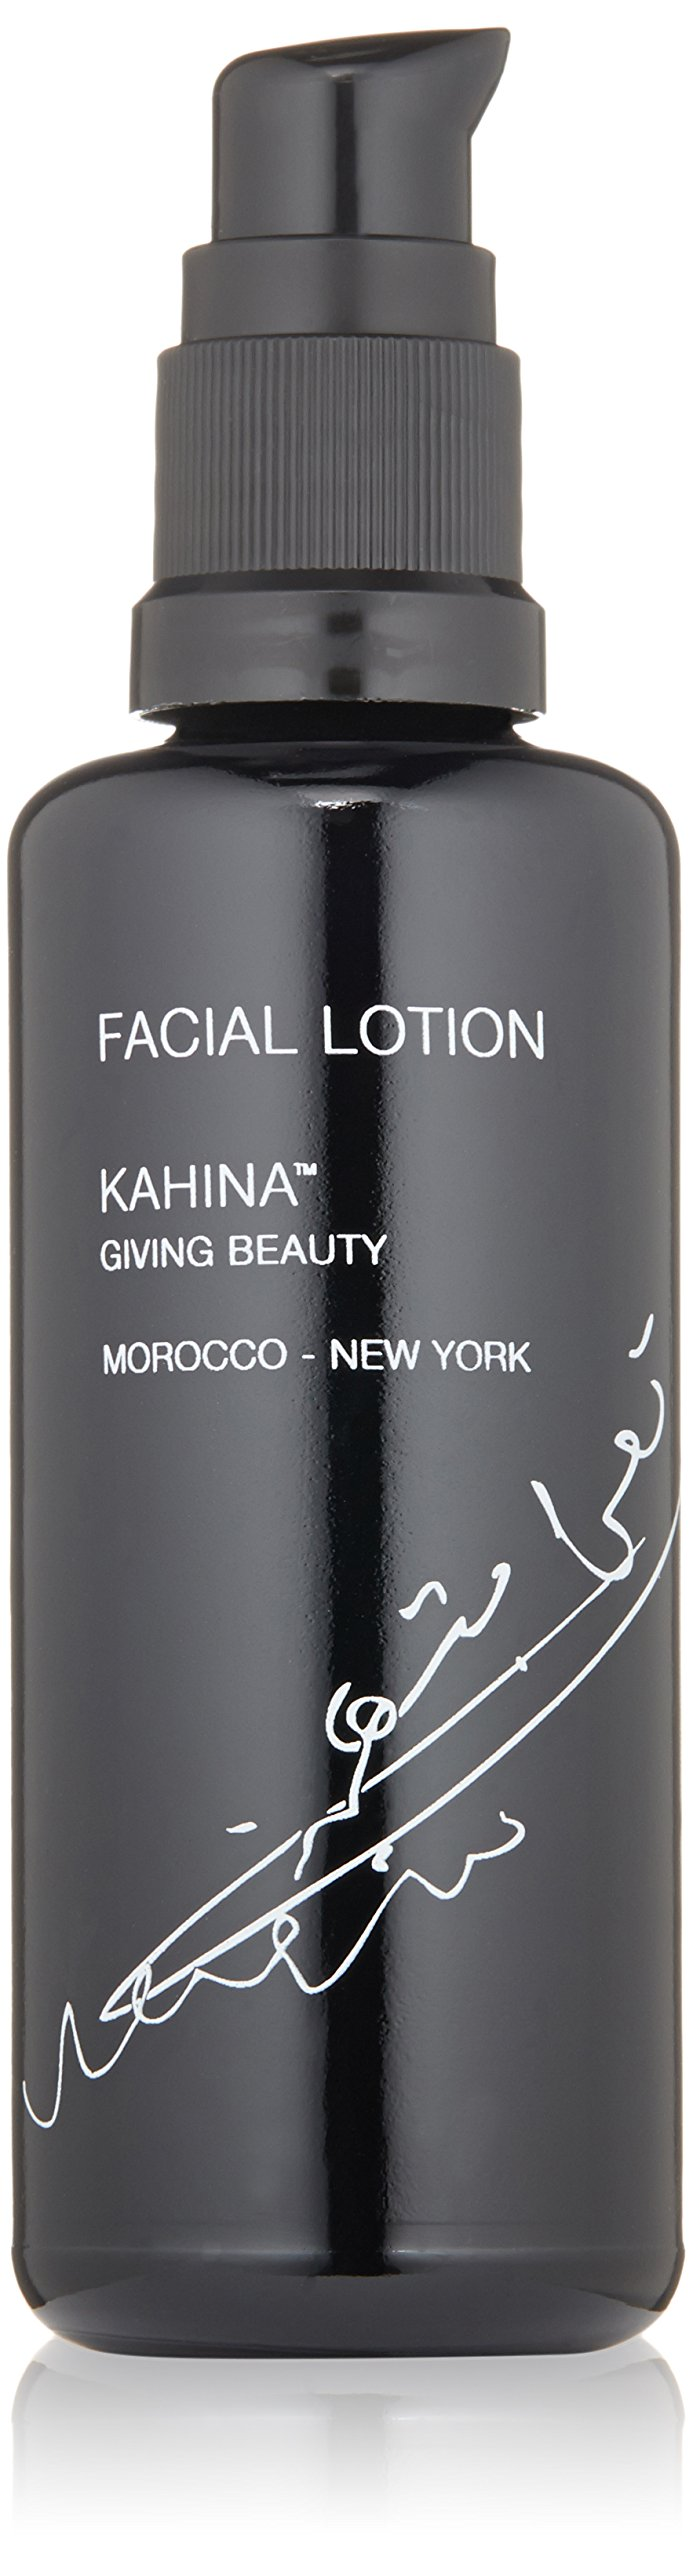 Kahina Giving Beauty Facial Lotion, 1.6 fl. oz.